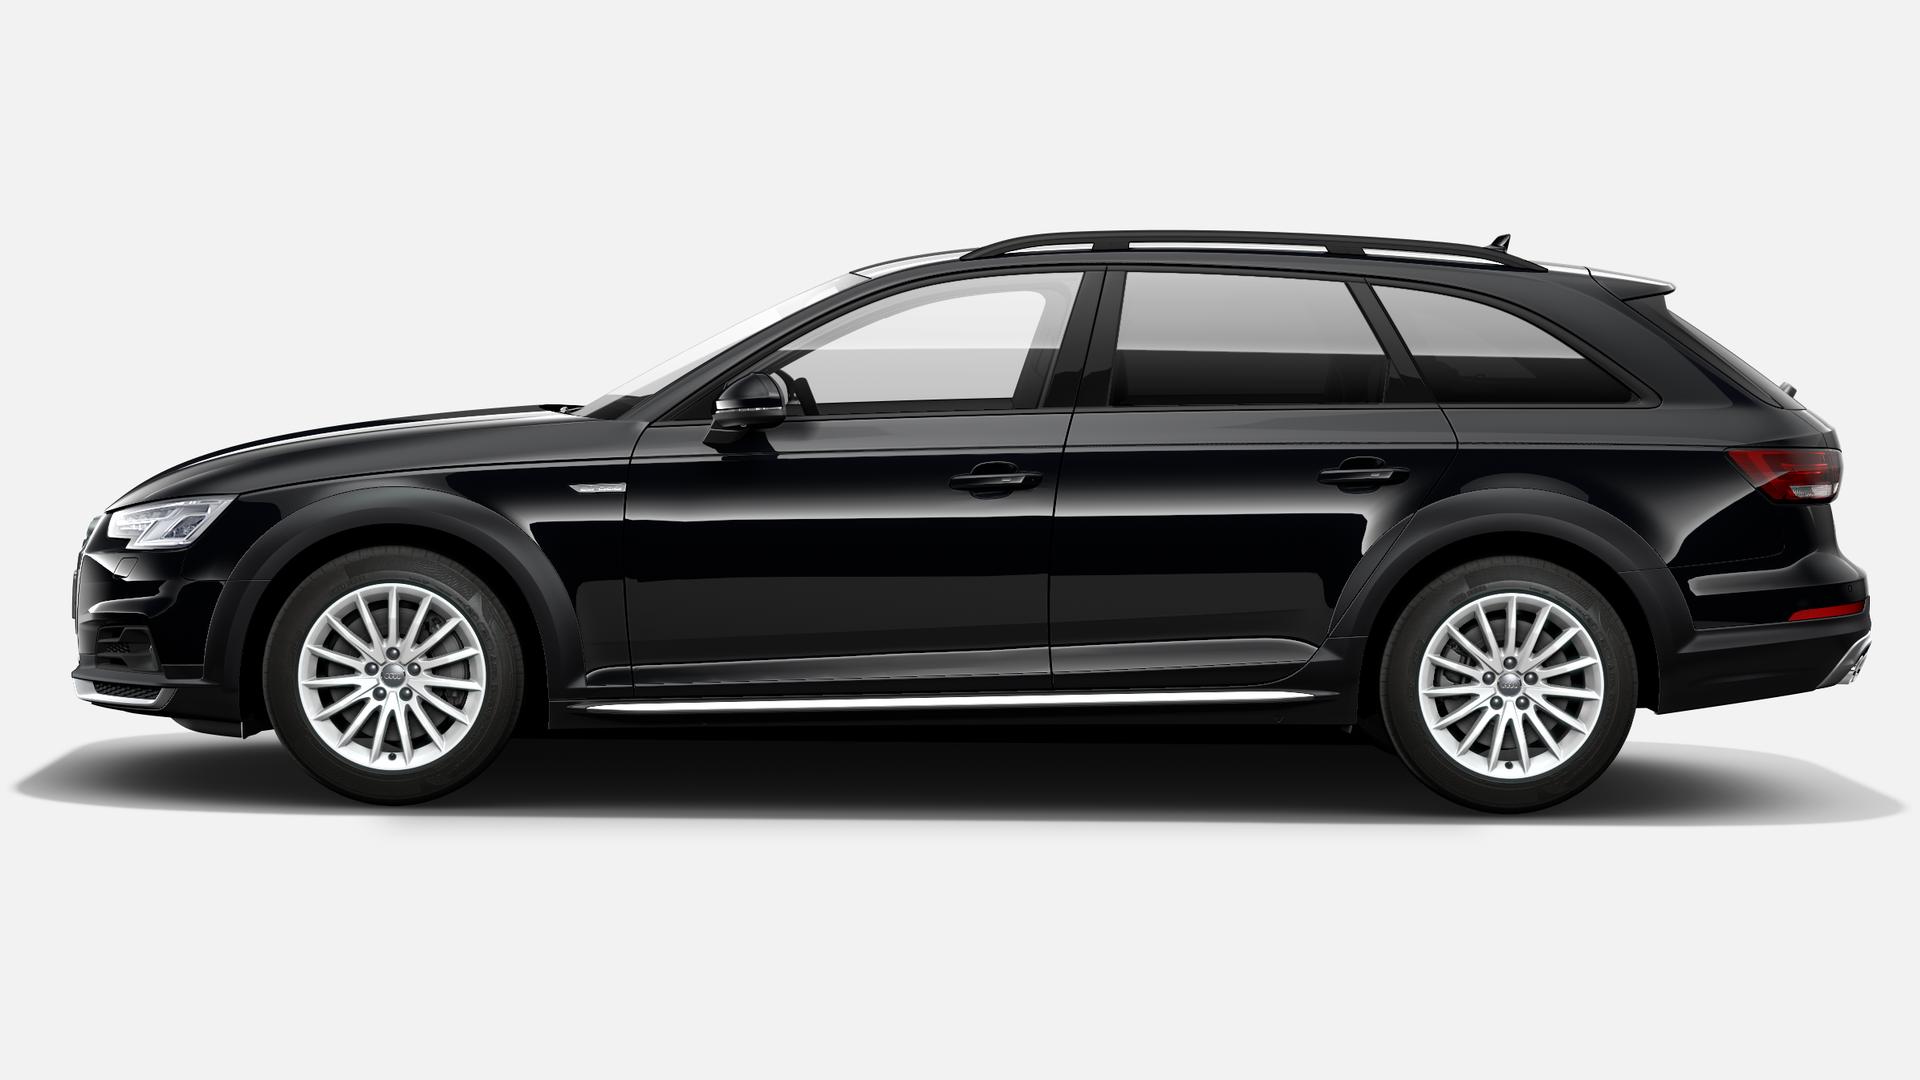 Vista Lateral izquierda de Audi A4 Allroad 2.0 TDI unlimited quattro S tronic 140 kW (190 CV)